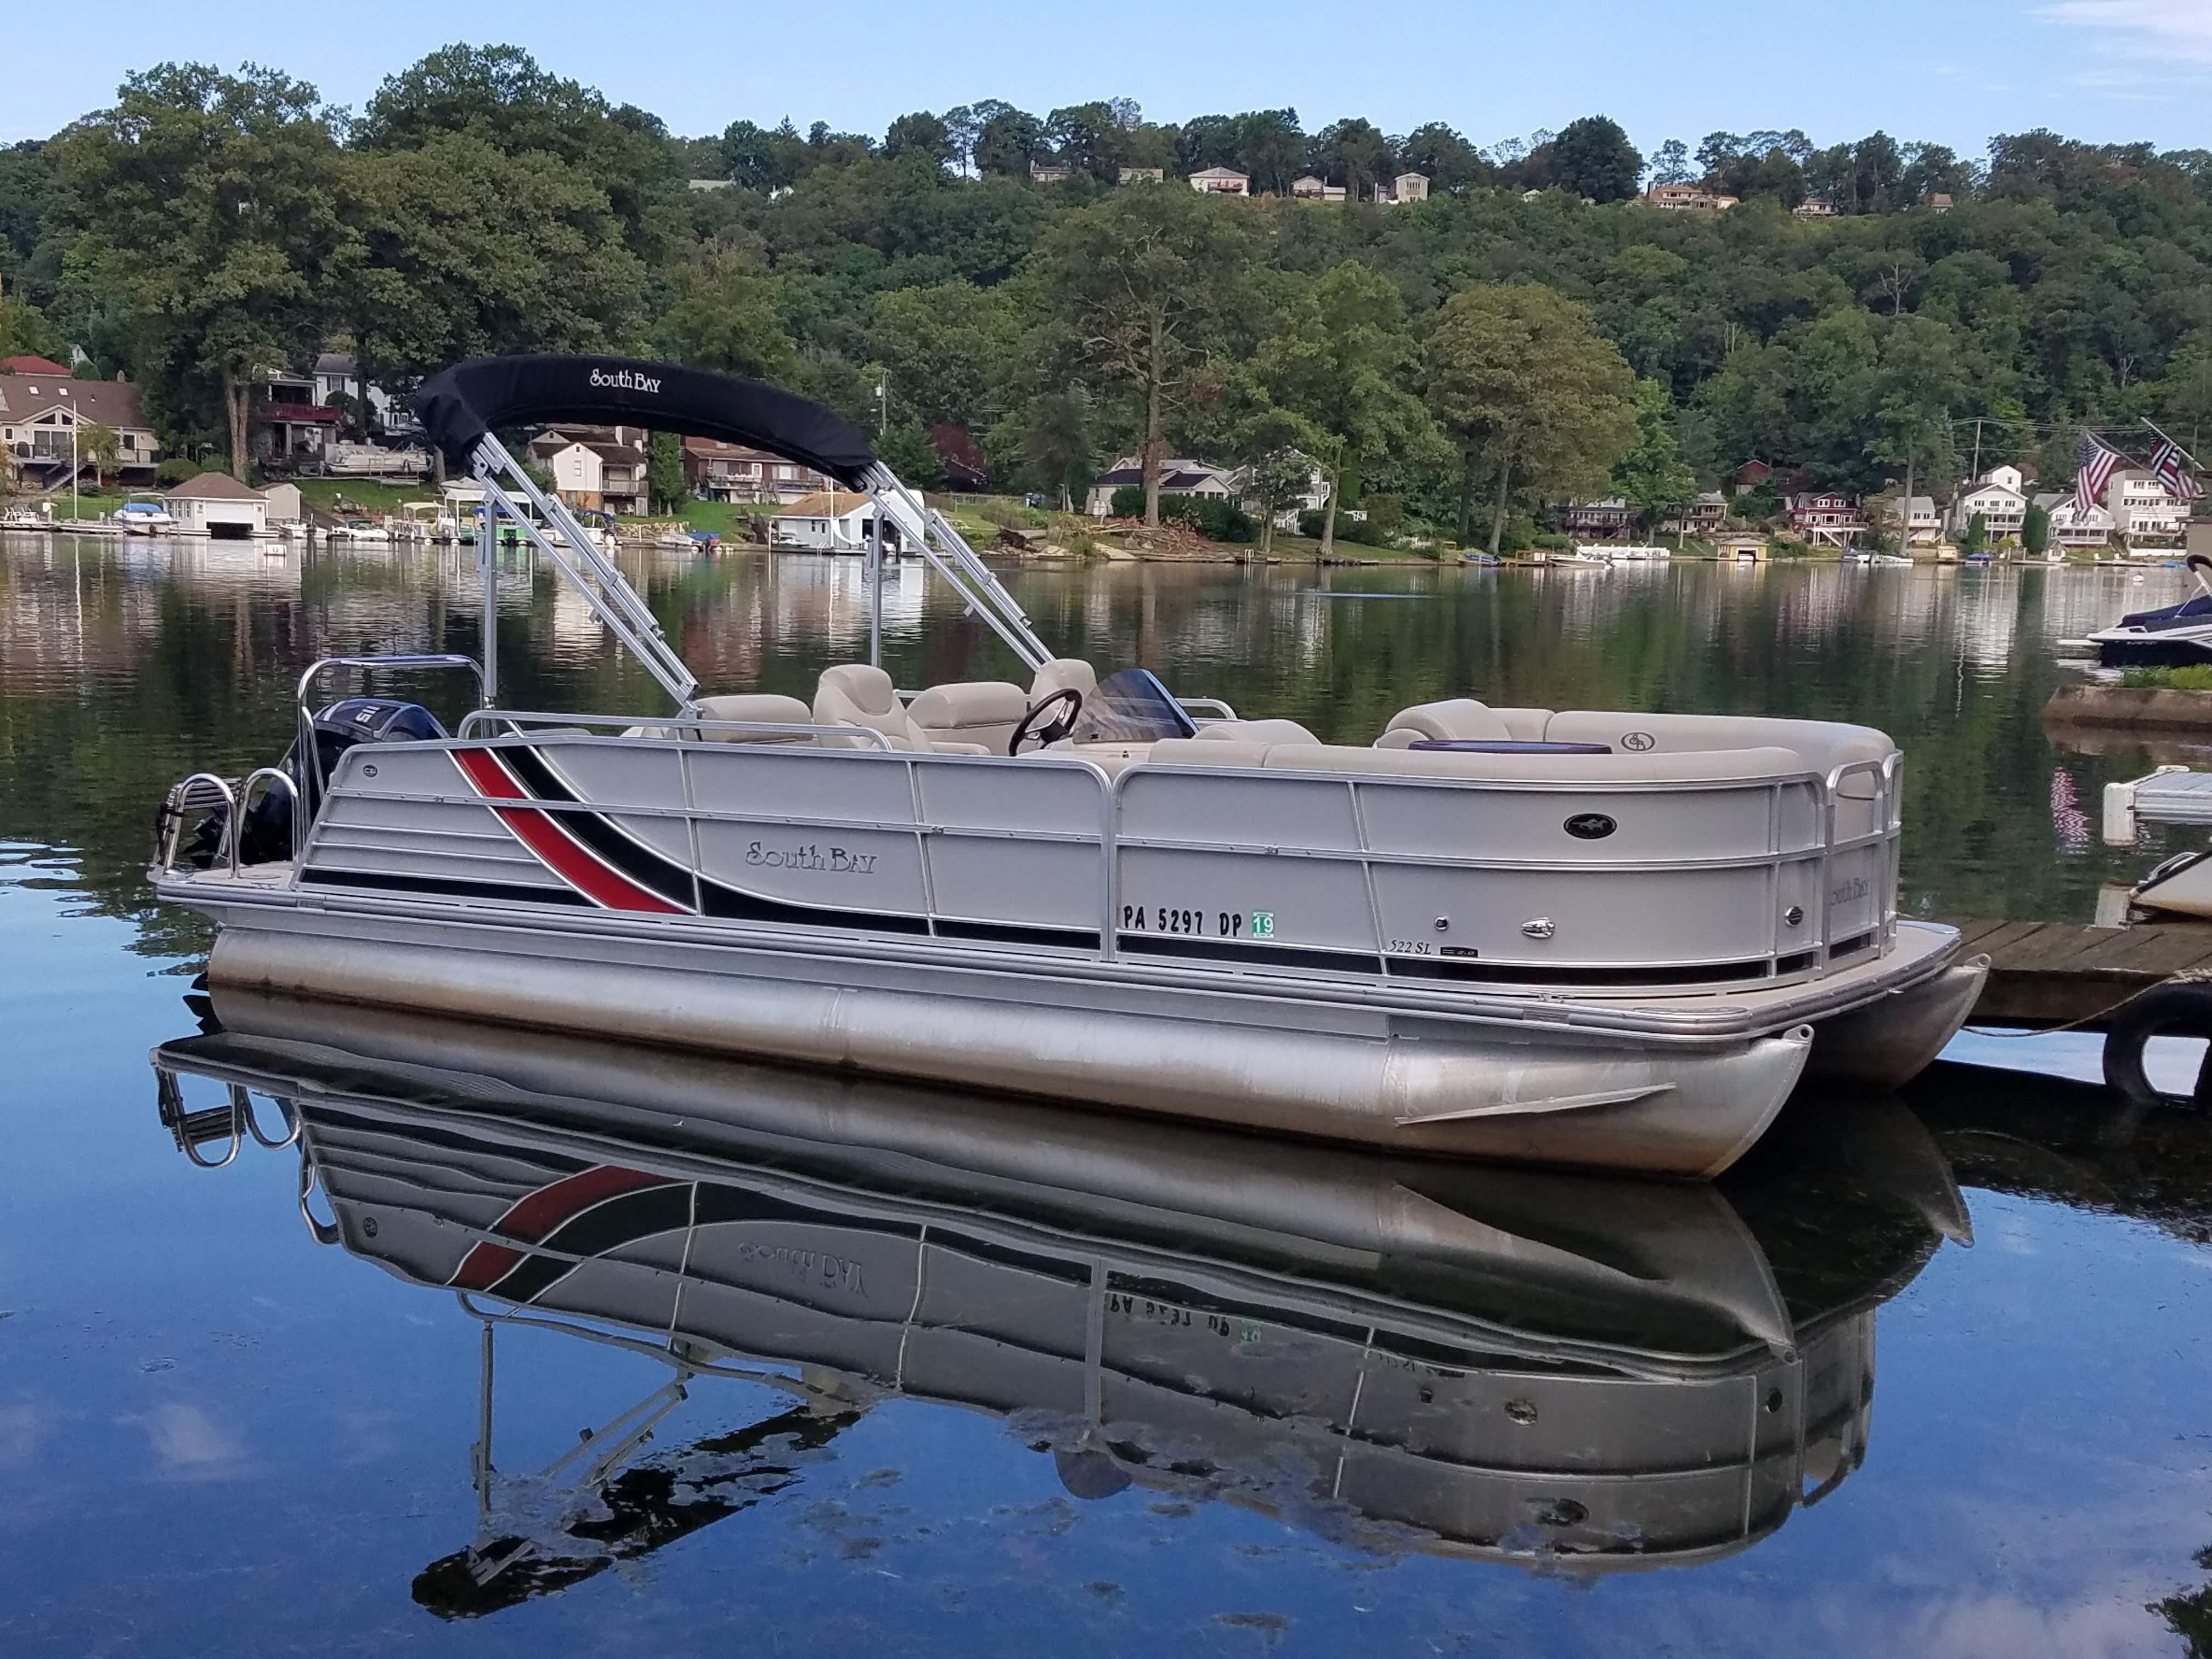 2015 South Bay 522 SL Pontoon Boat for sale - YachtWorld